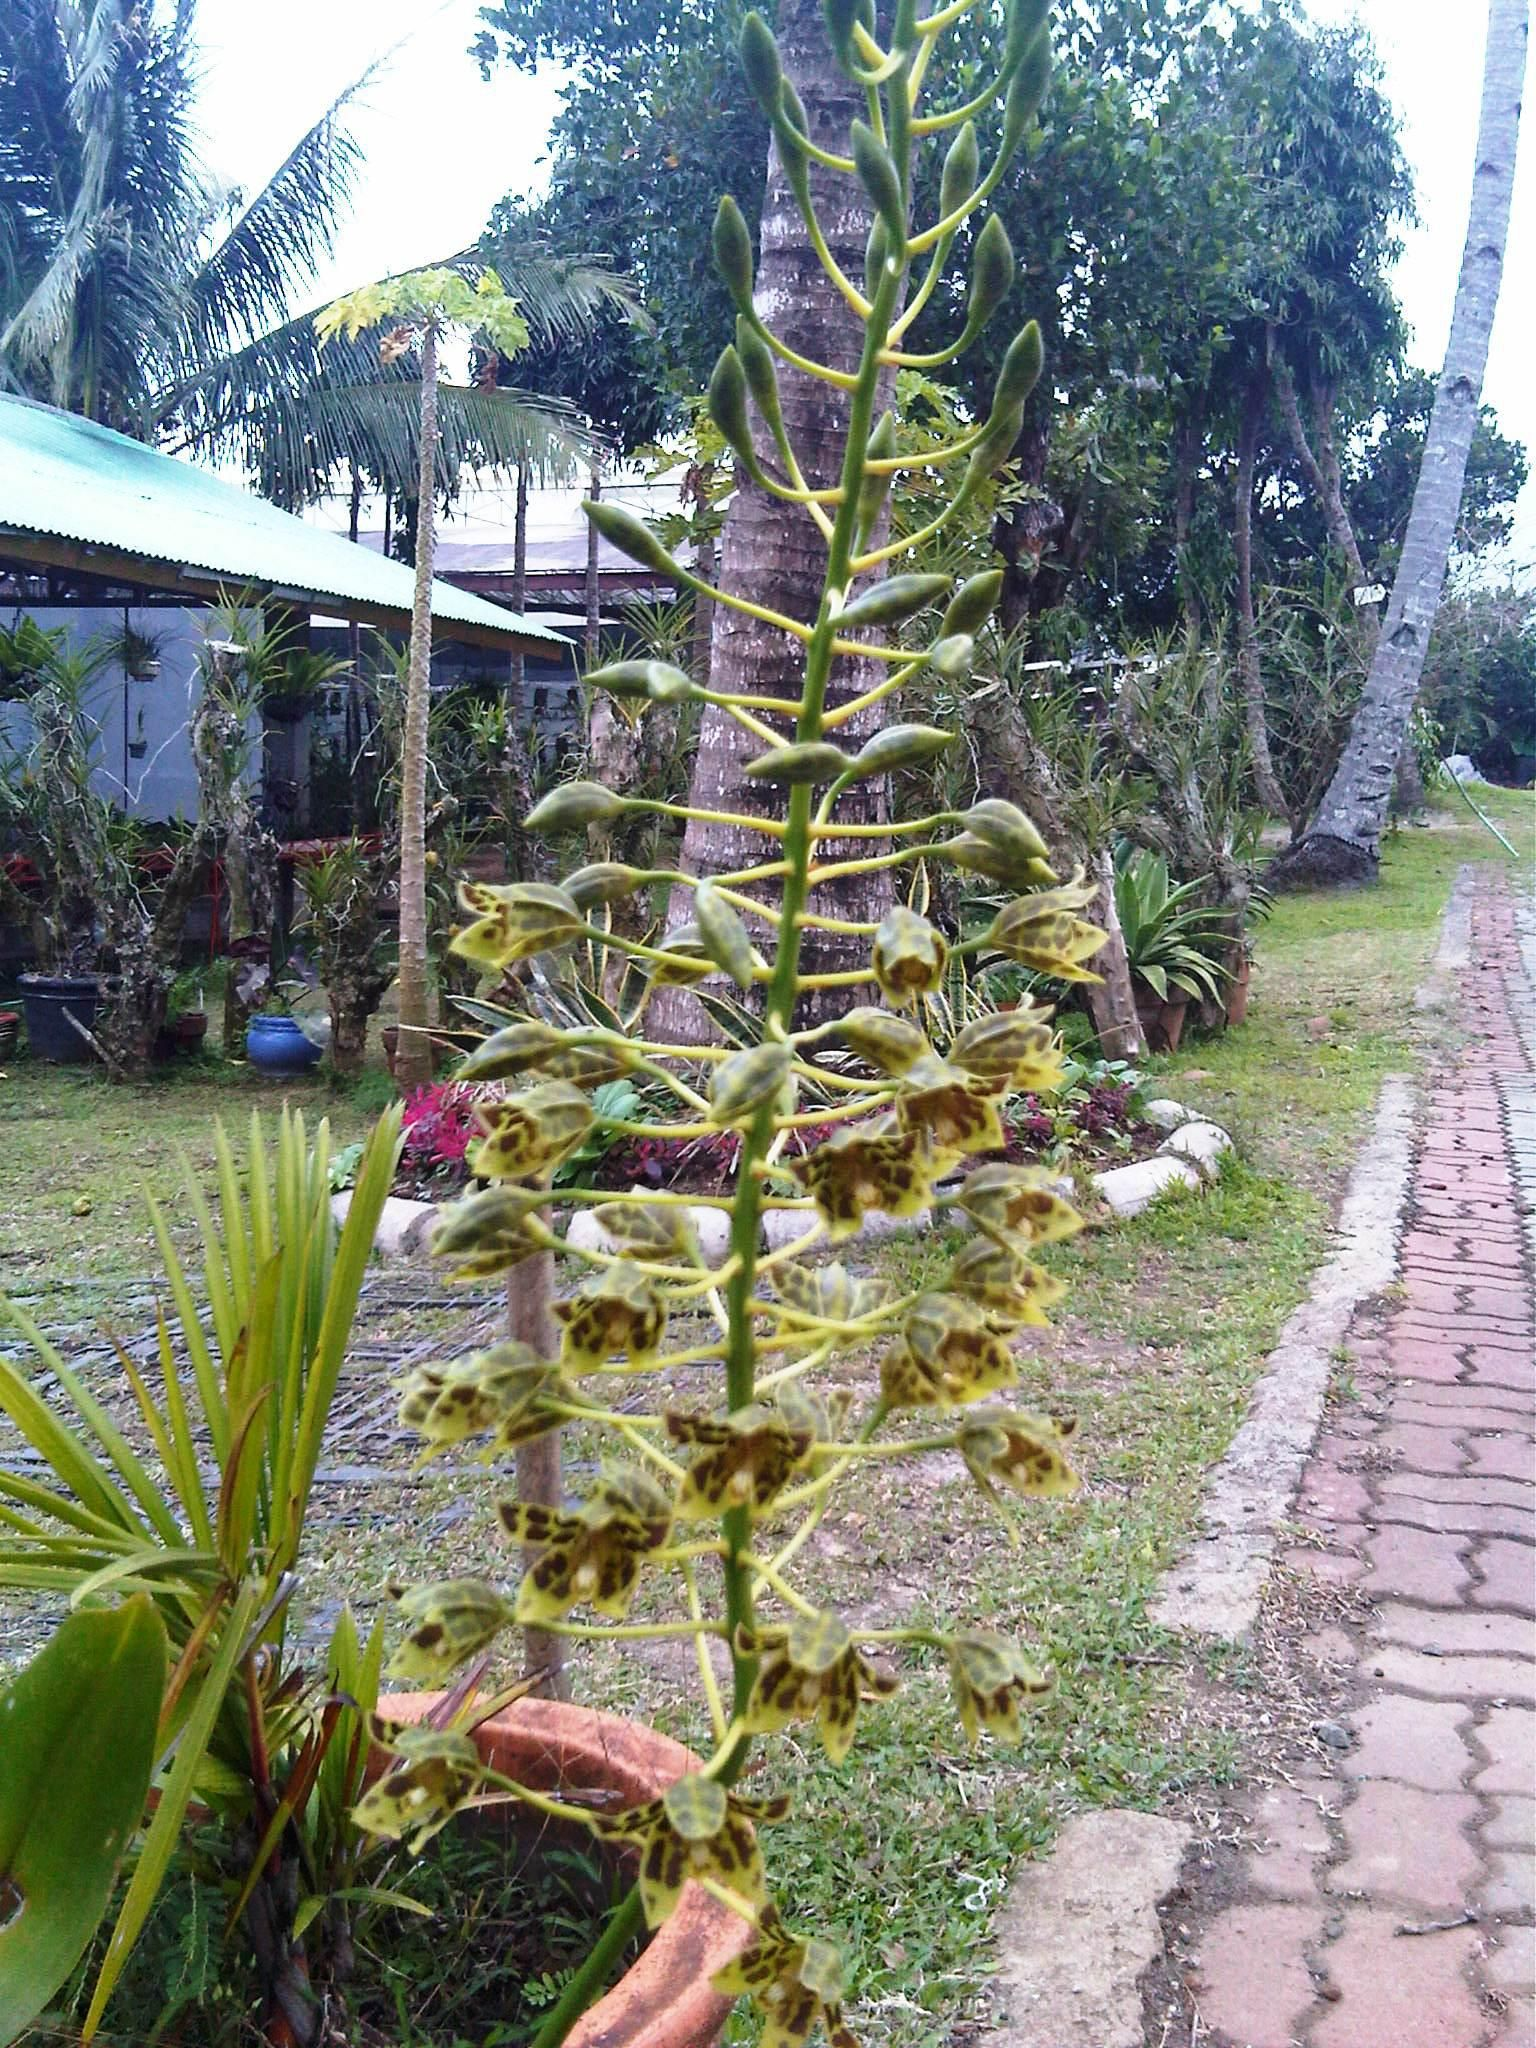 Gramatophylum Plants, Flowers, Philippines